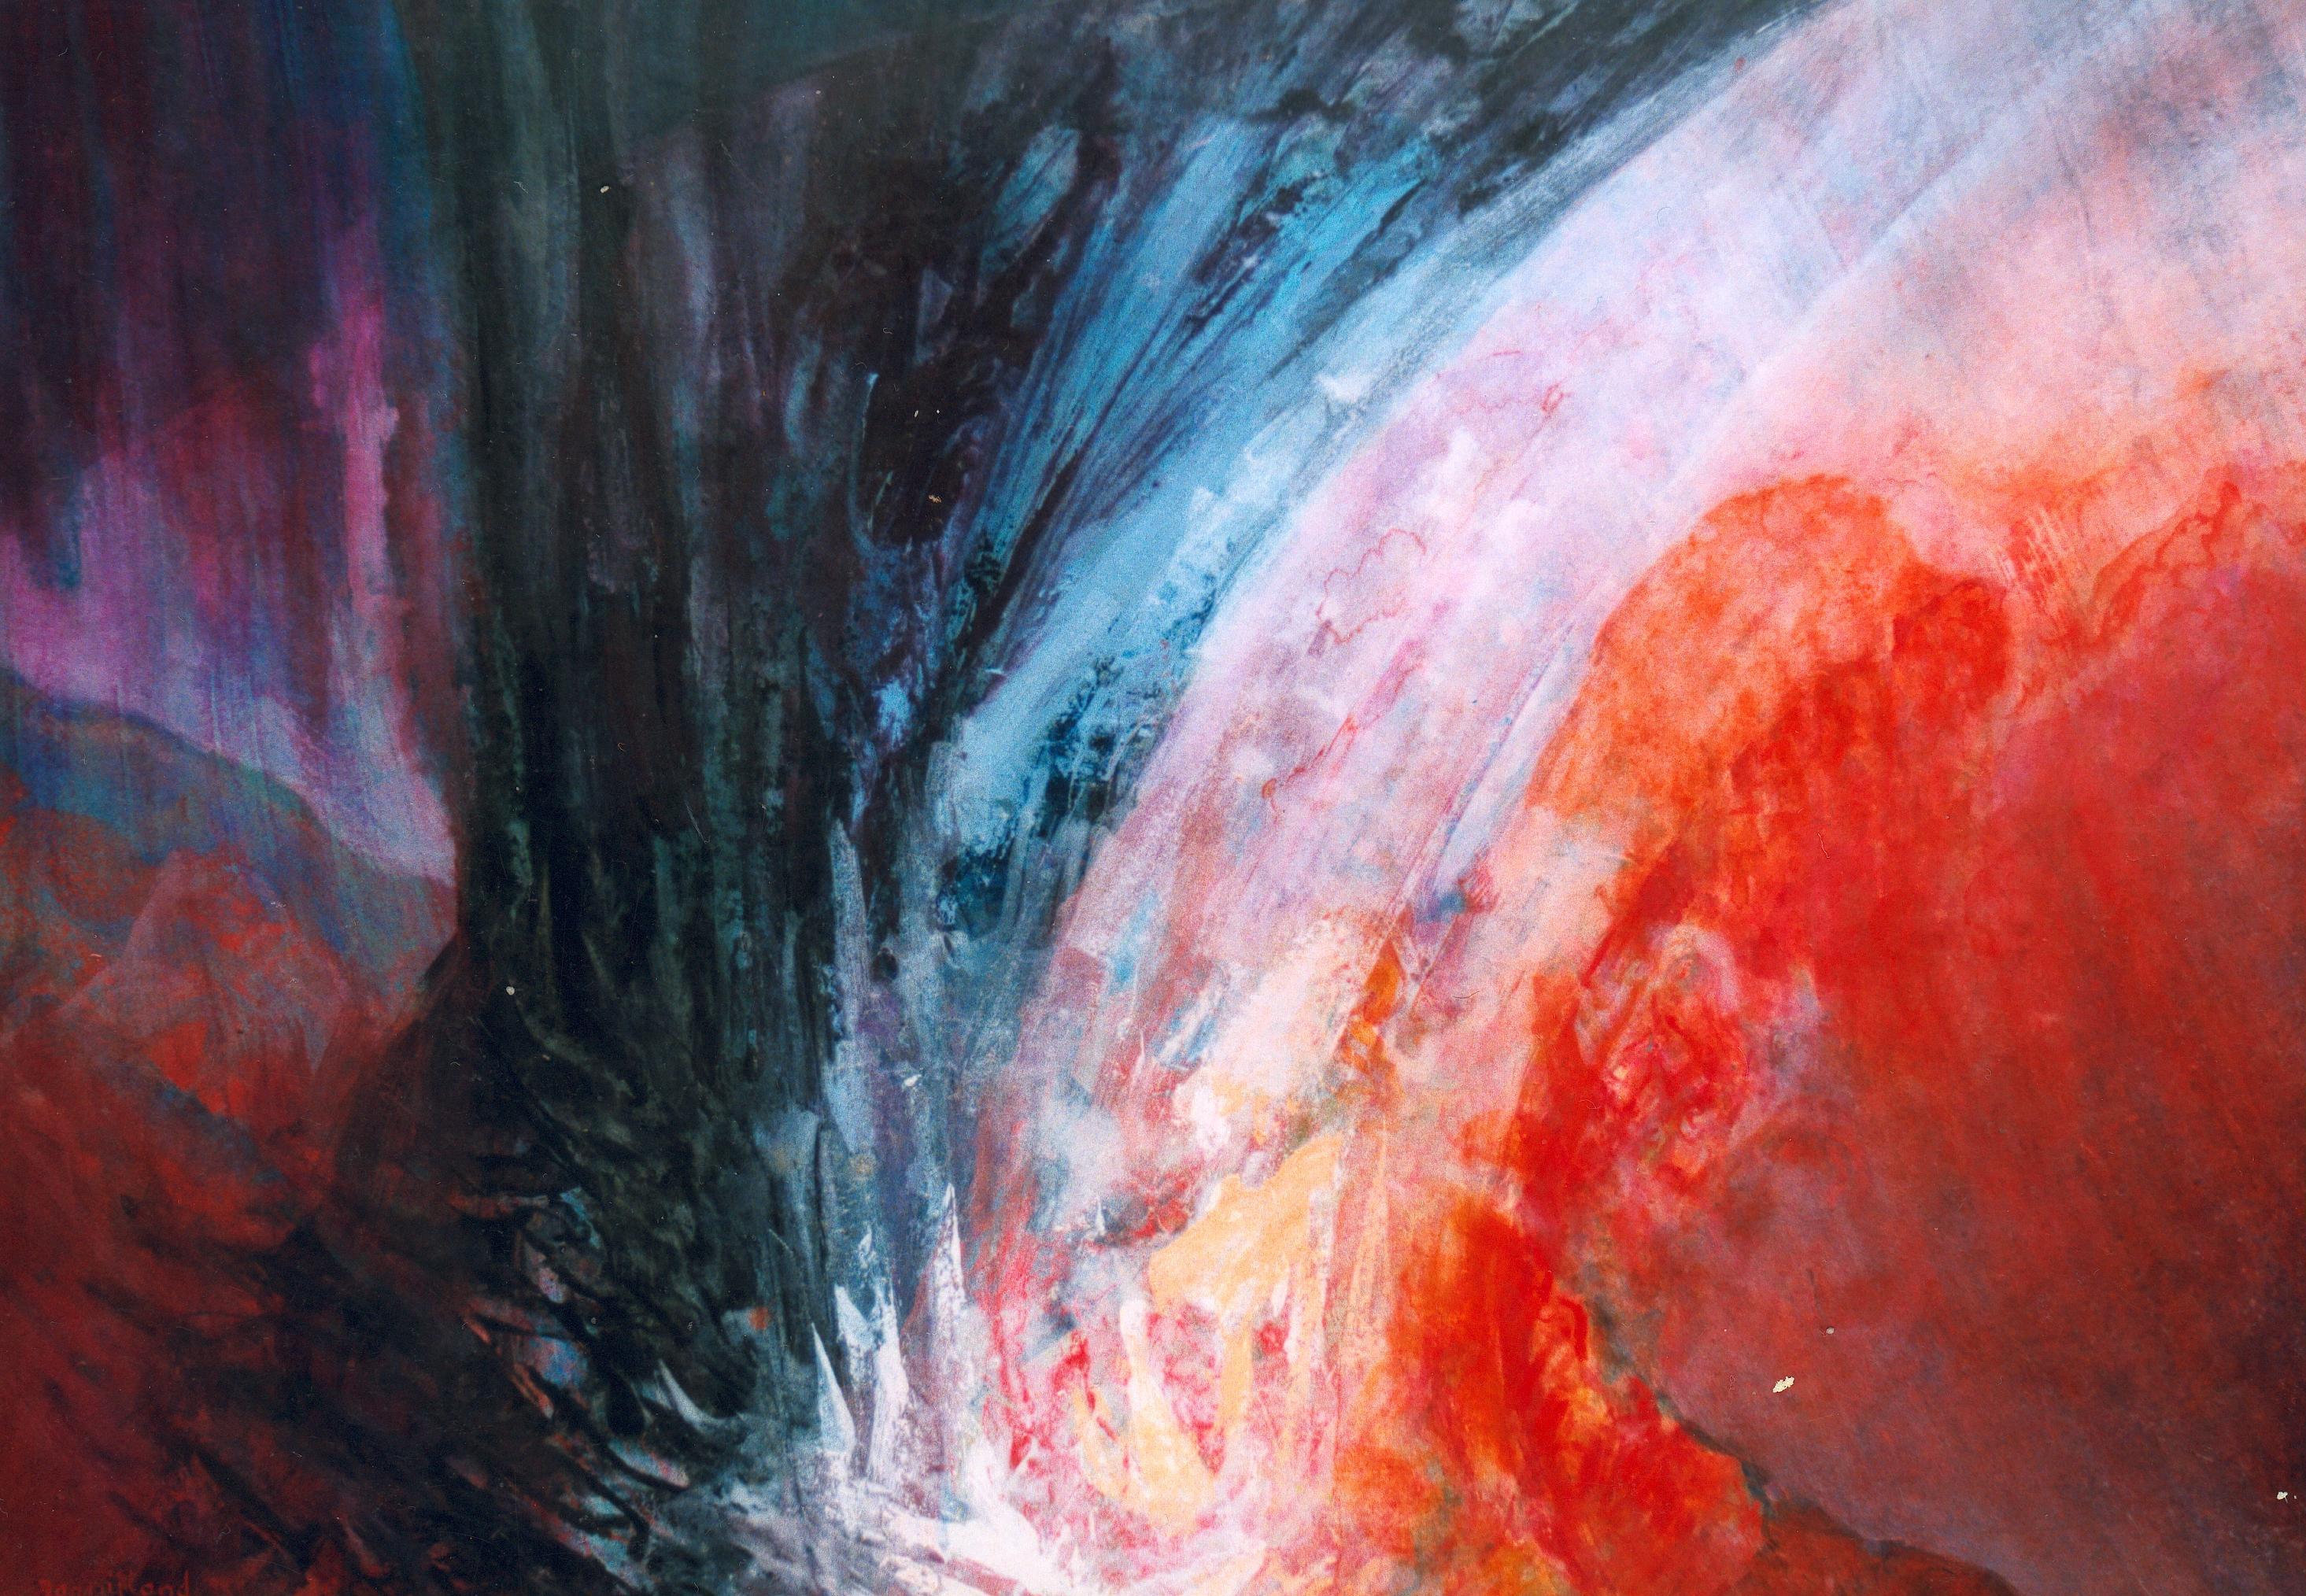 uitbarsting / explosion